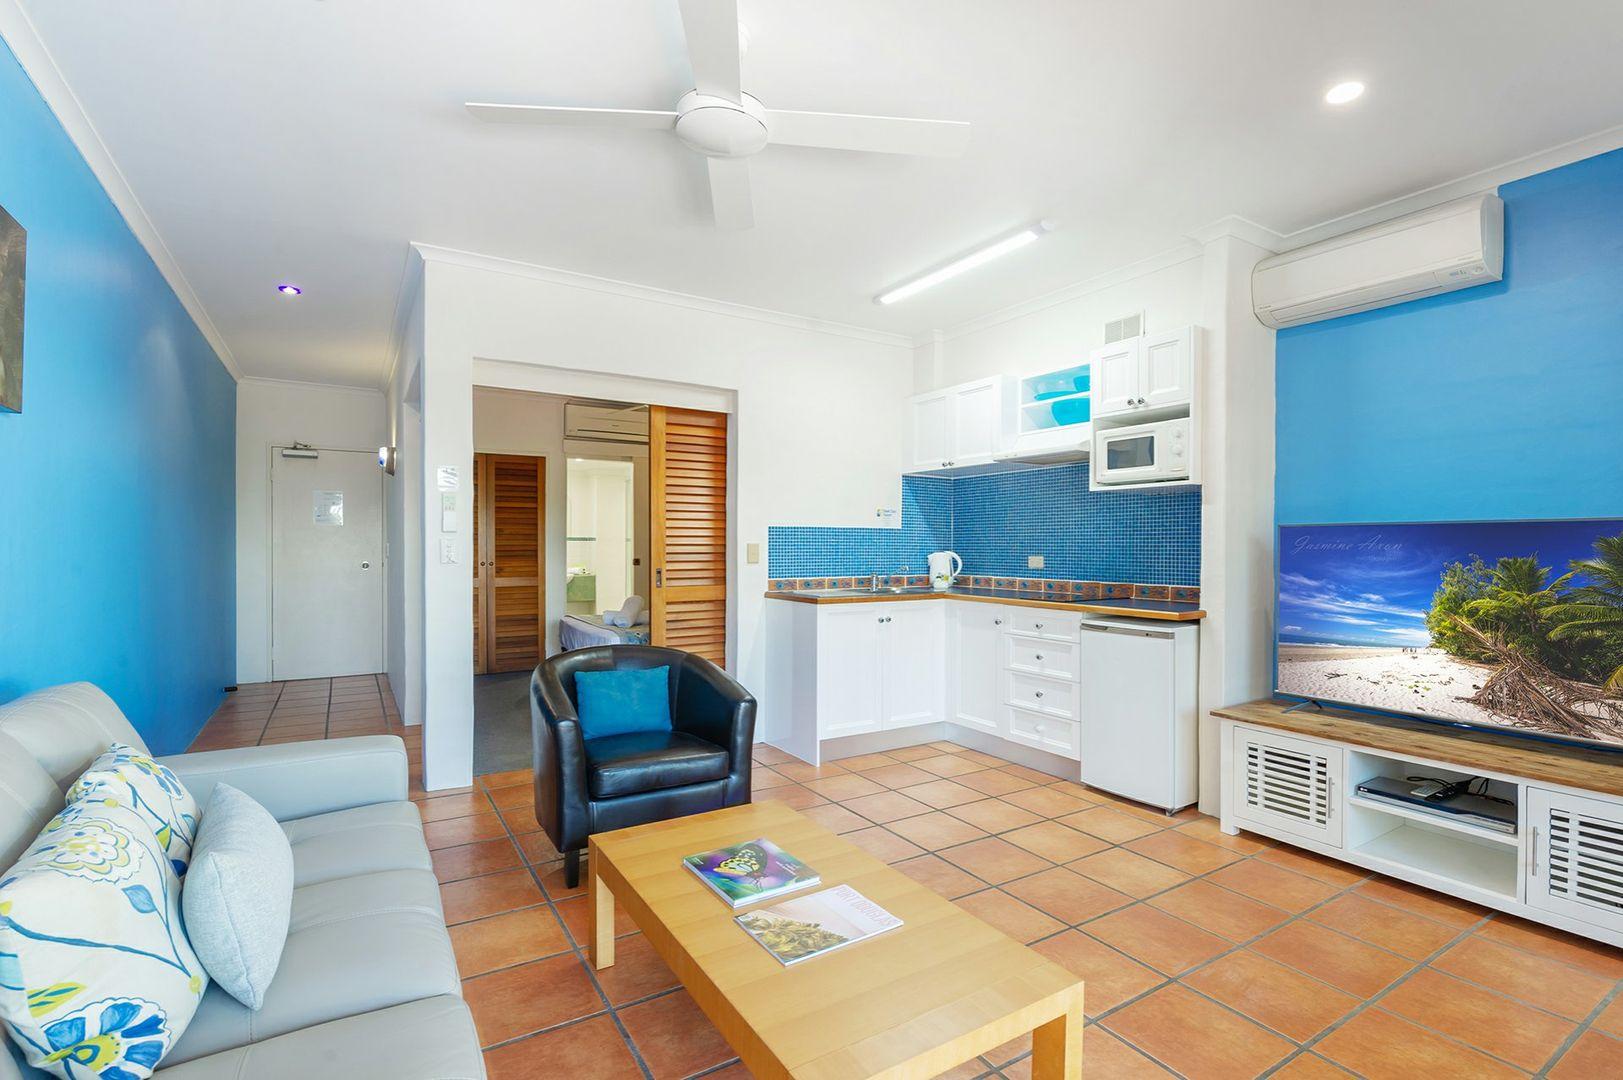 27 Reef Club/64 Davidson Street, Port Douglas QLD 4877, Image 0